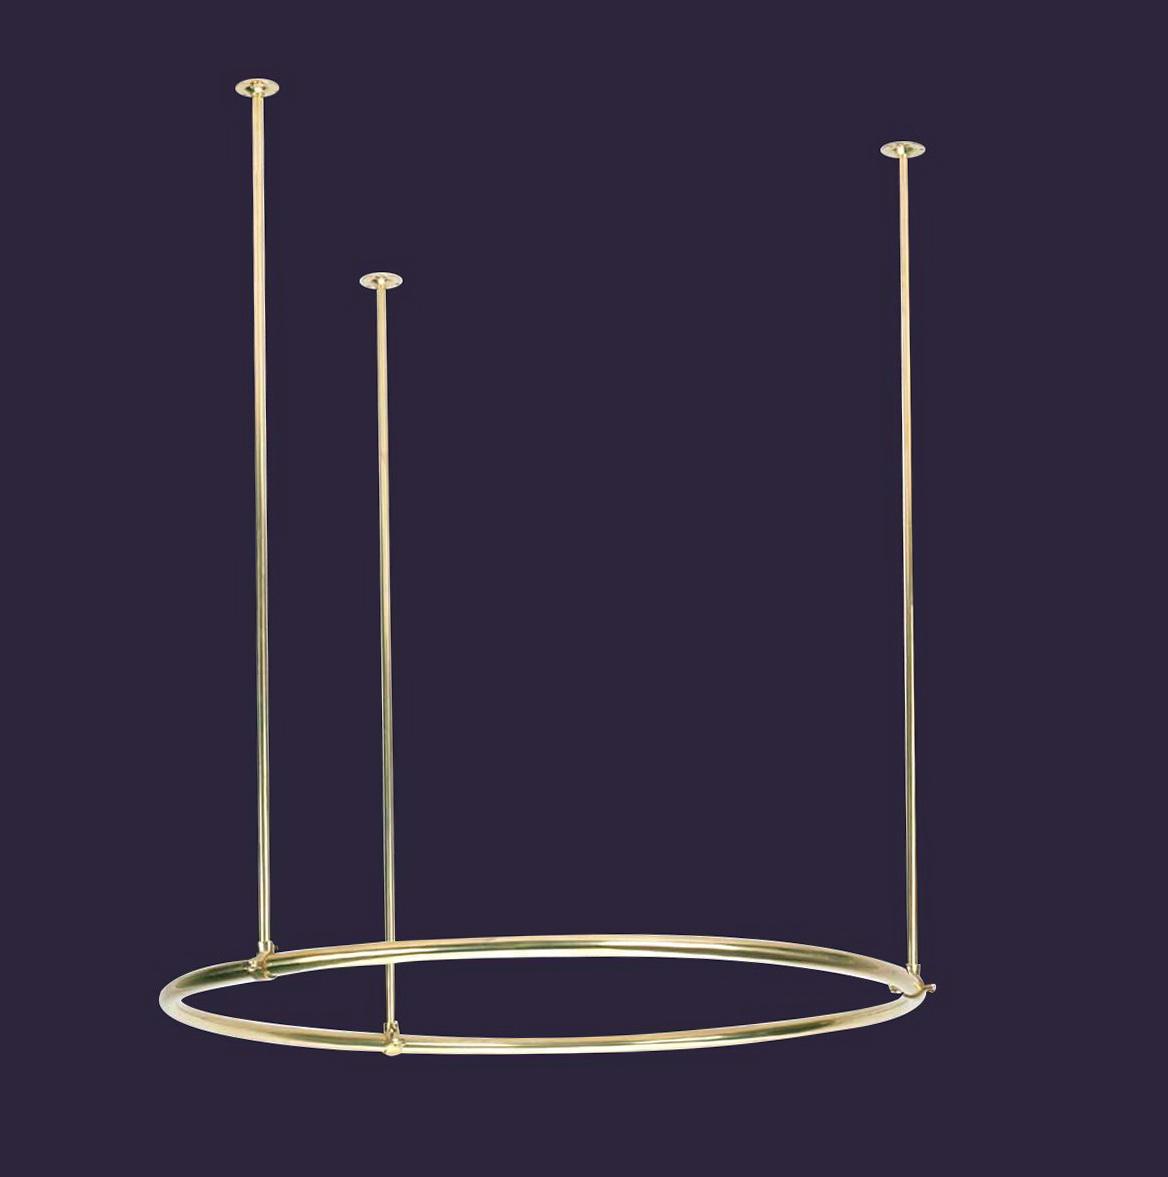 Circular Shower Curtain Rod For Clawfoot Tub